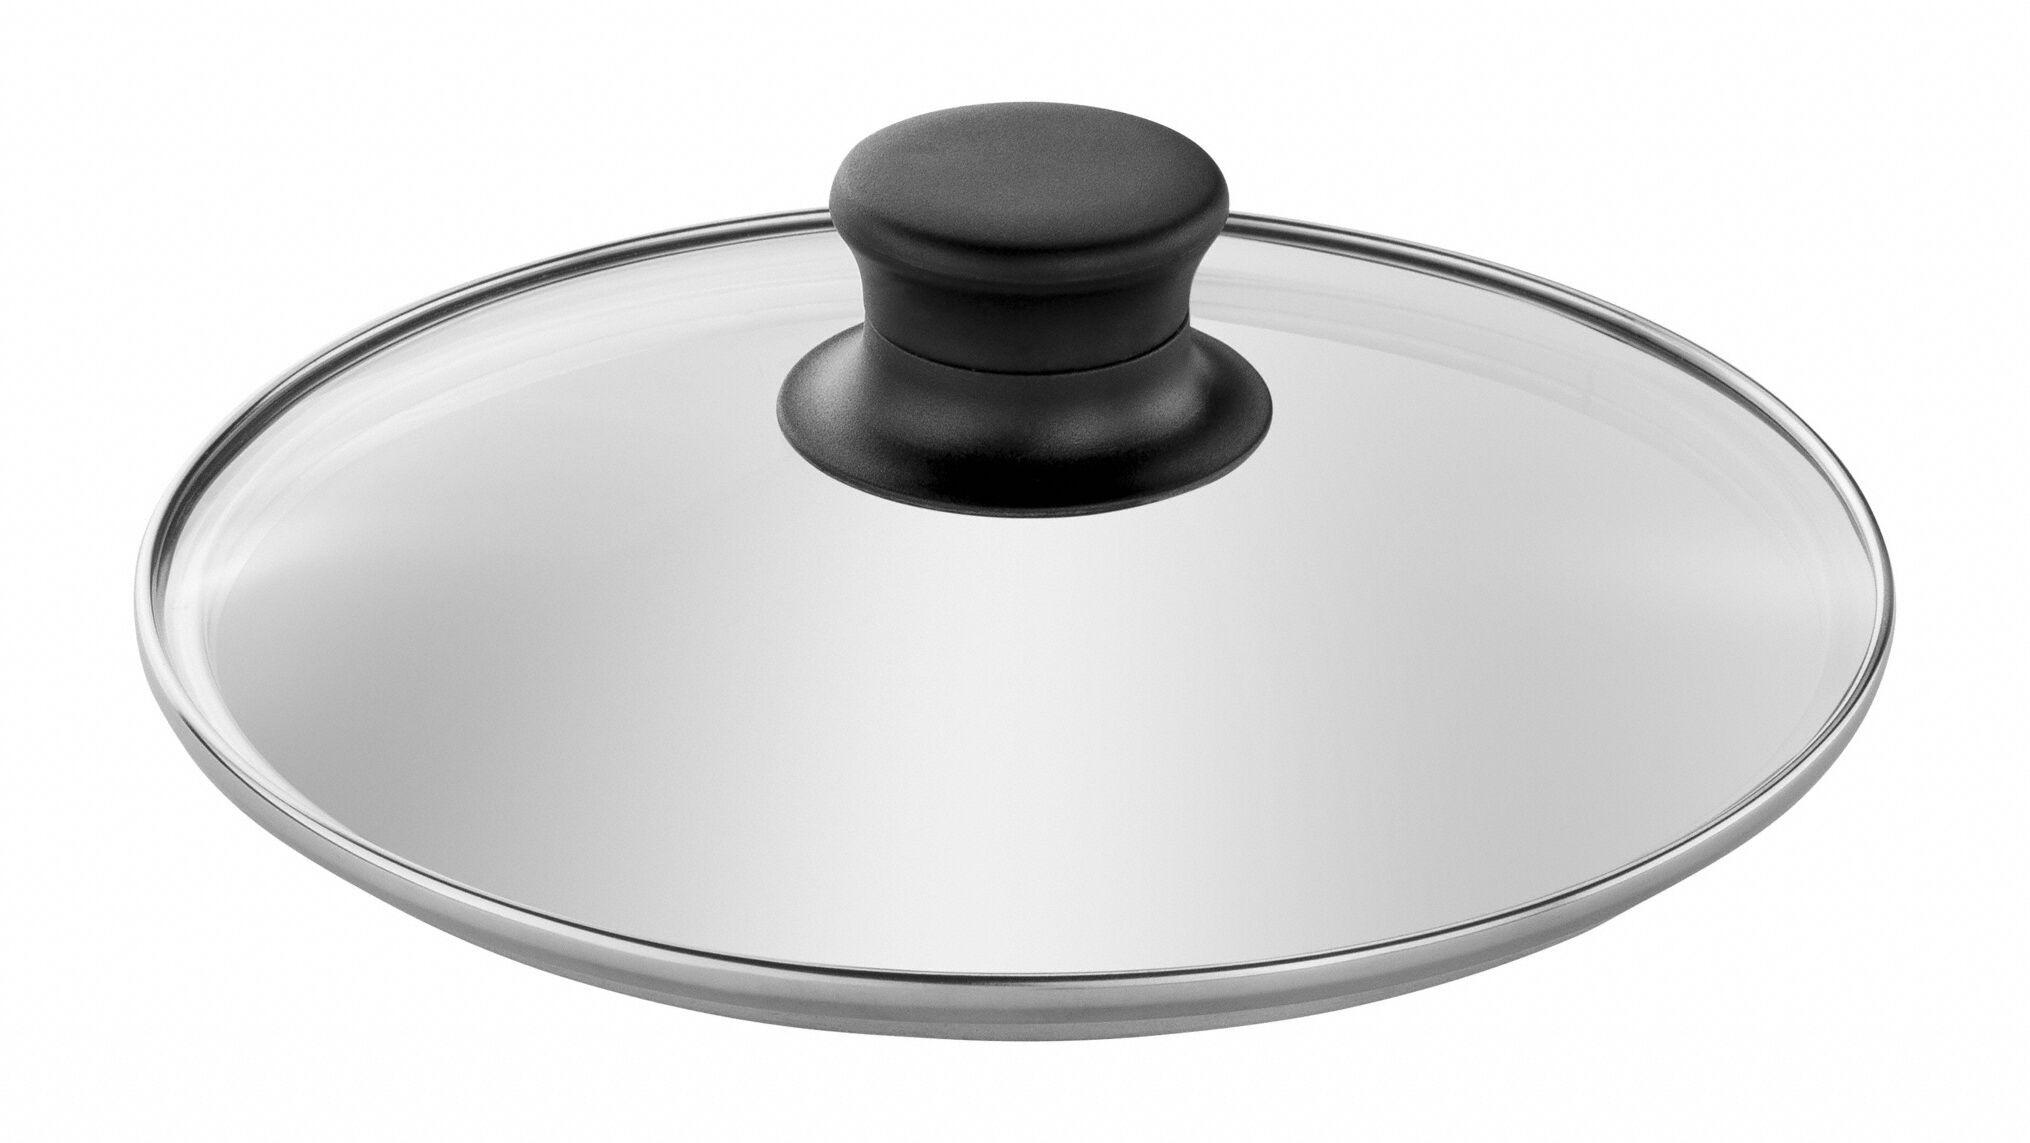 ZWILLING Glaslåg 22 cm, EcoQuick trykkogere